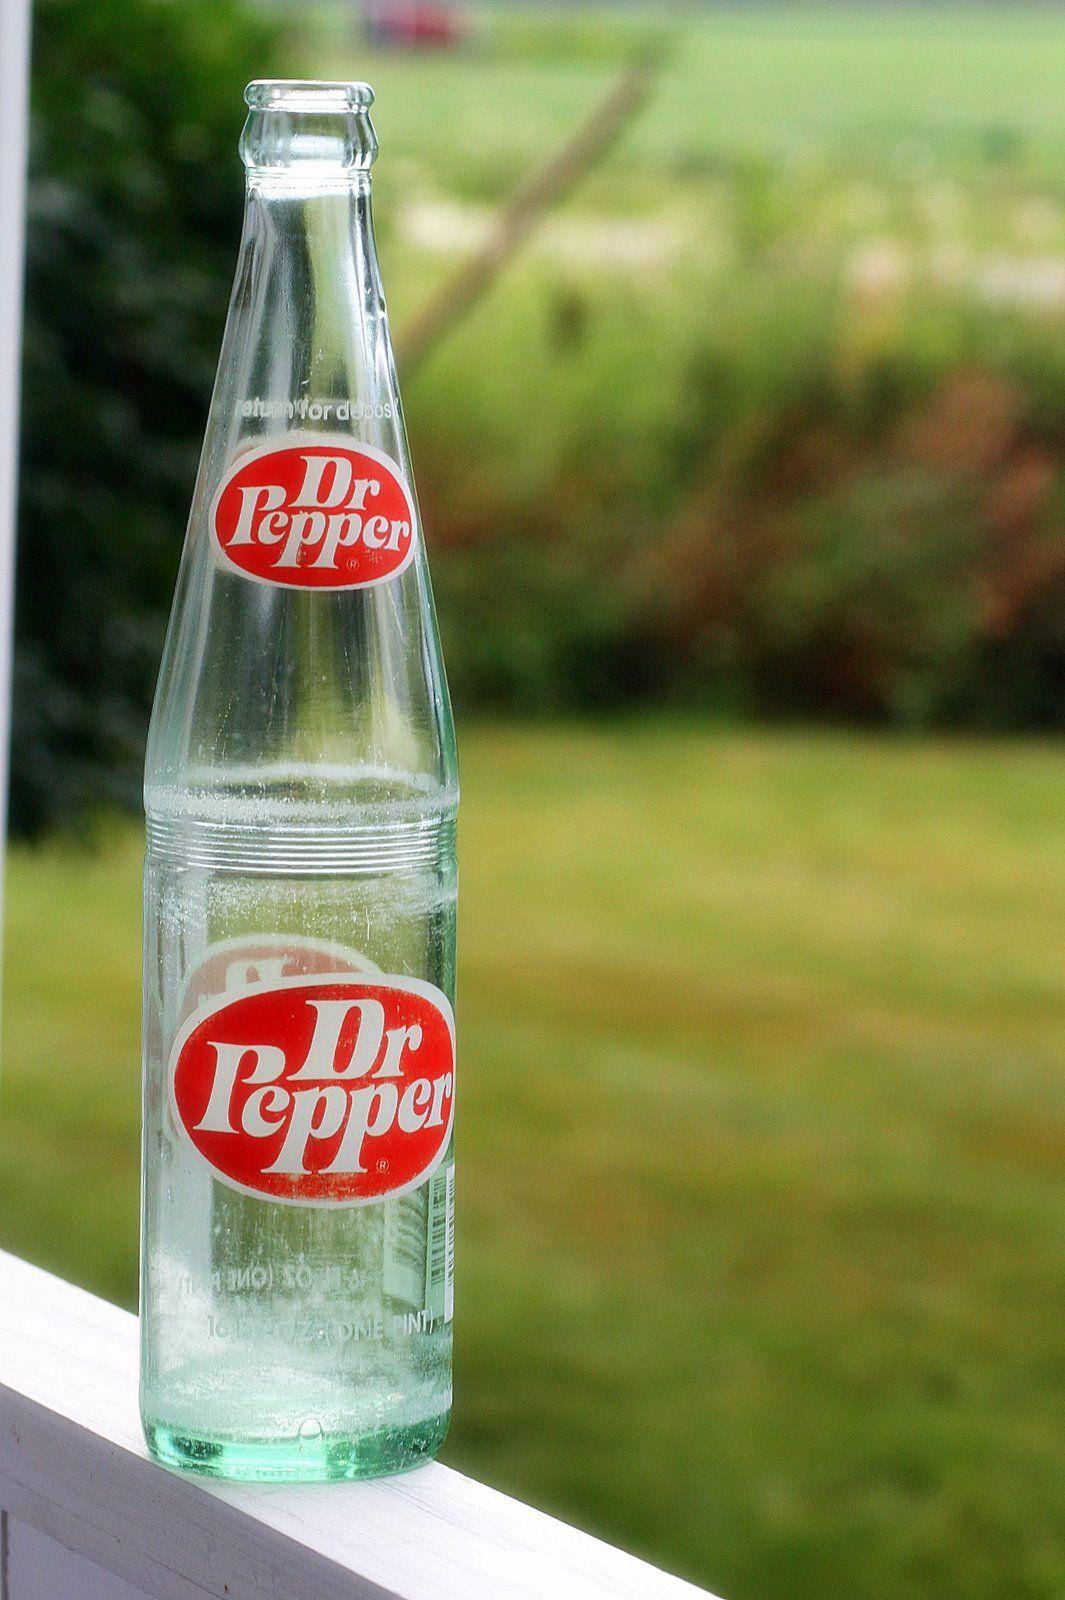 Dr. Pepper. Grandma Drank Pepper And Drink